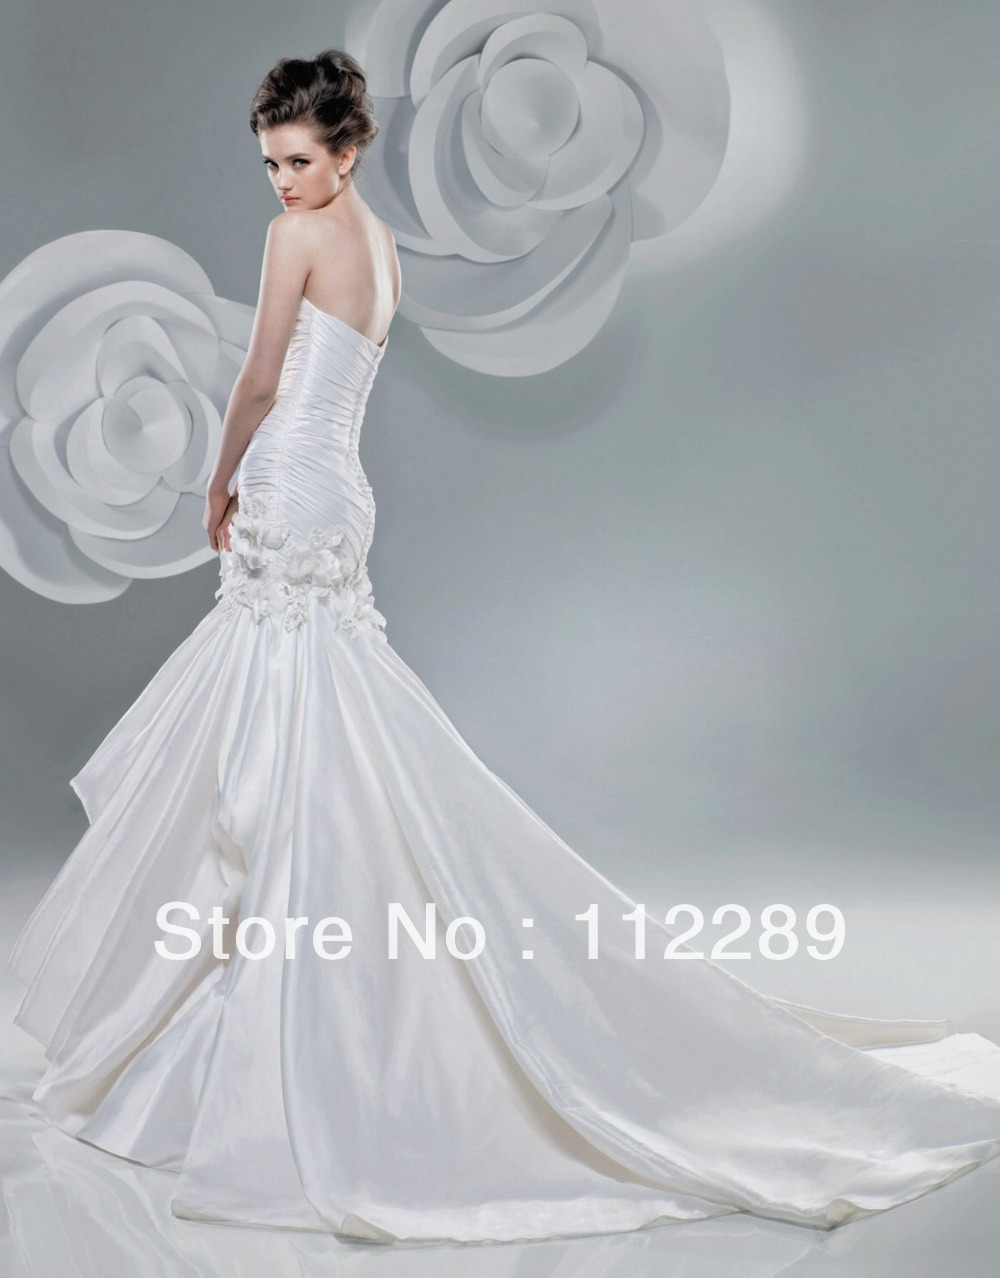 Magnificent Japanese Party Dress Festooning - Wedding Dress - googeb.com